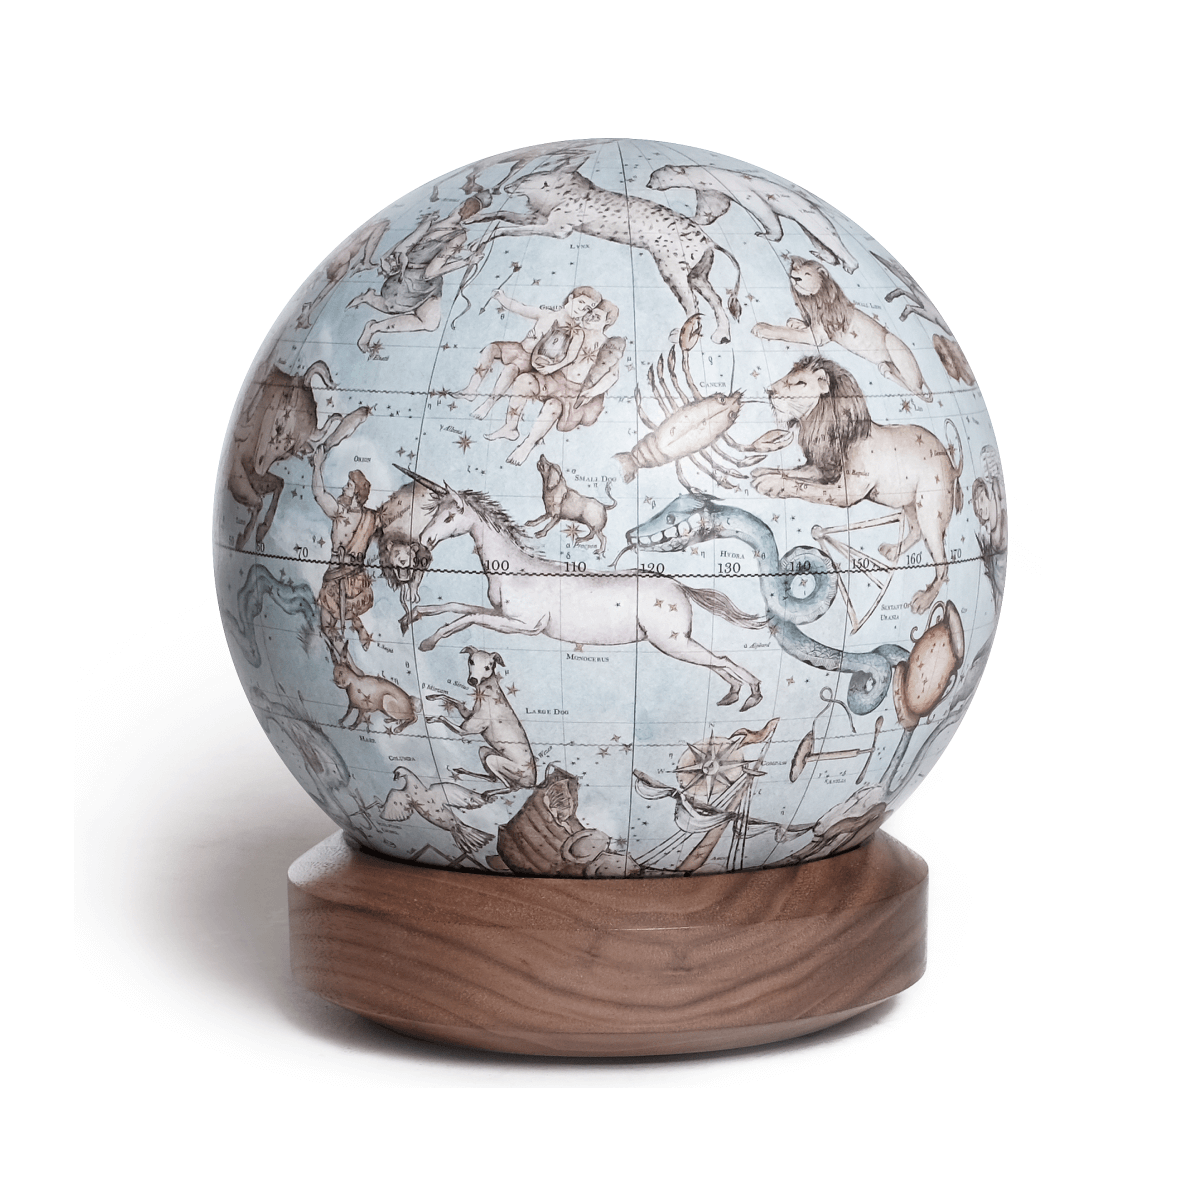 Bellerby & Co Custom Globe Commission